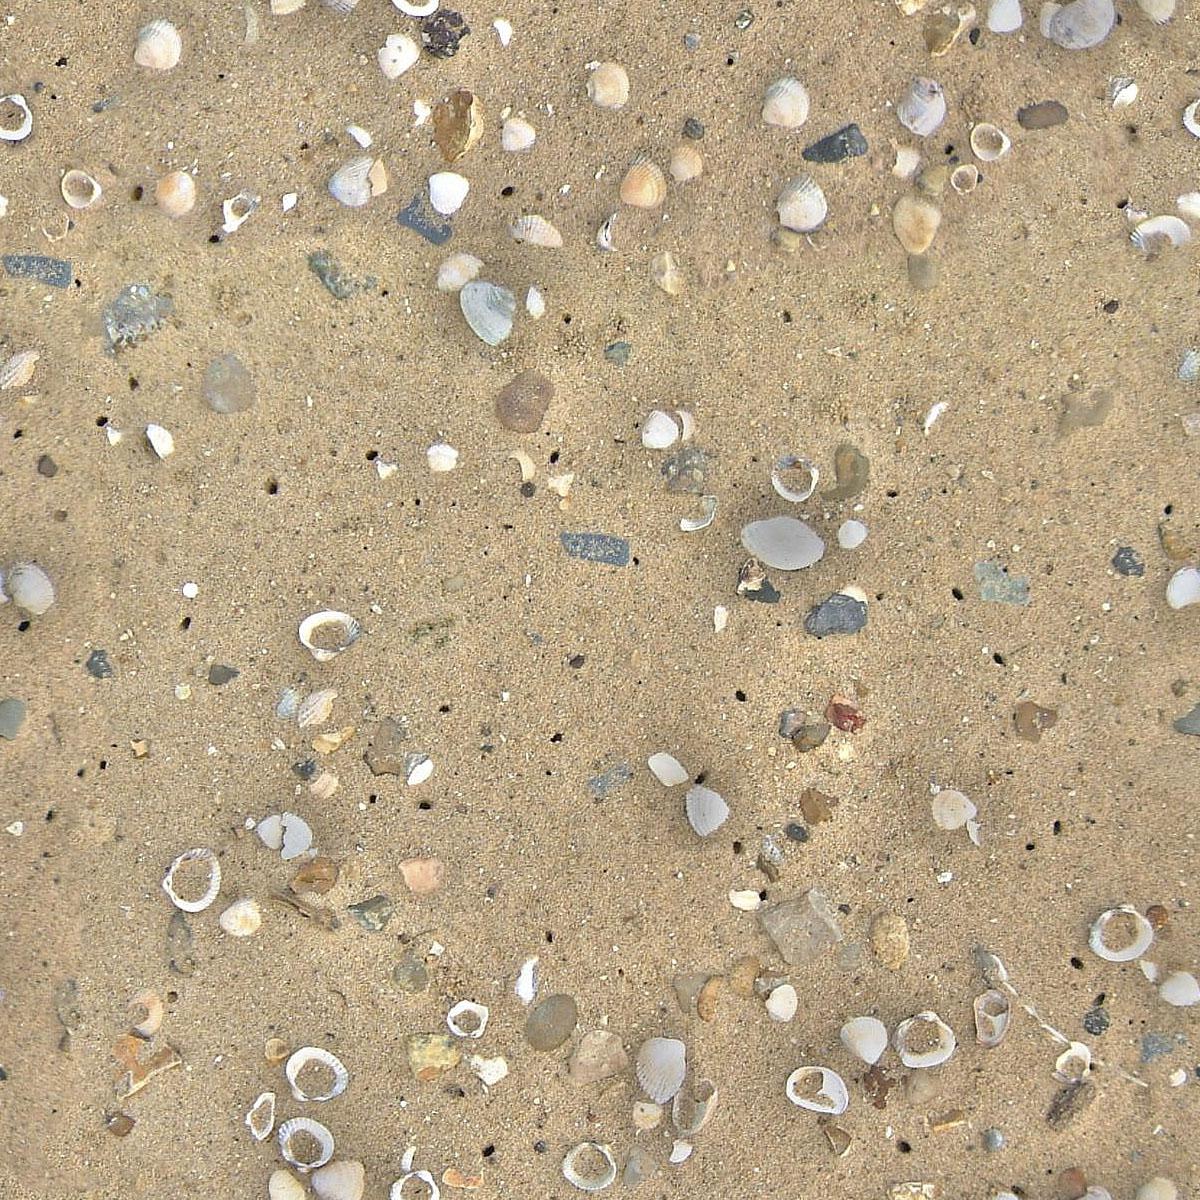 Seamless Beach Sand and Shells Texture + Bump Map ...